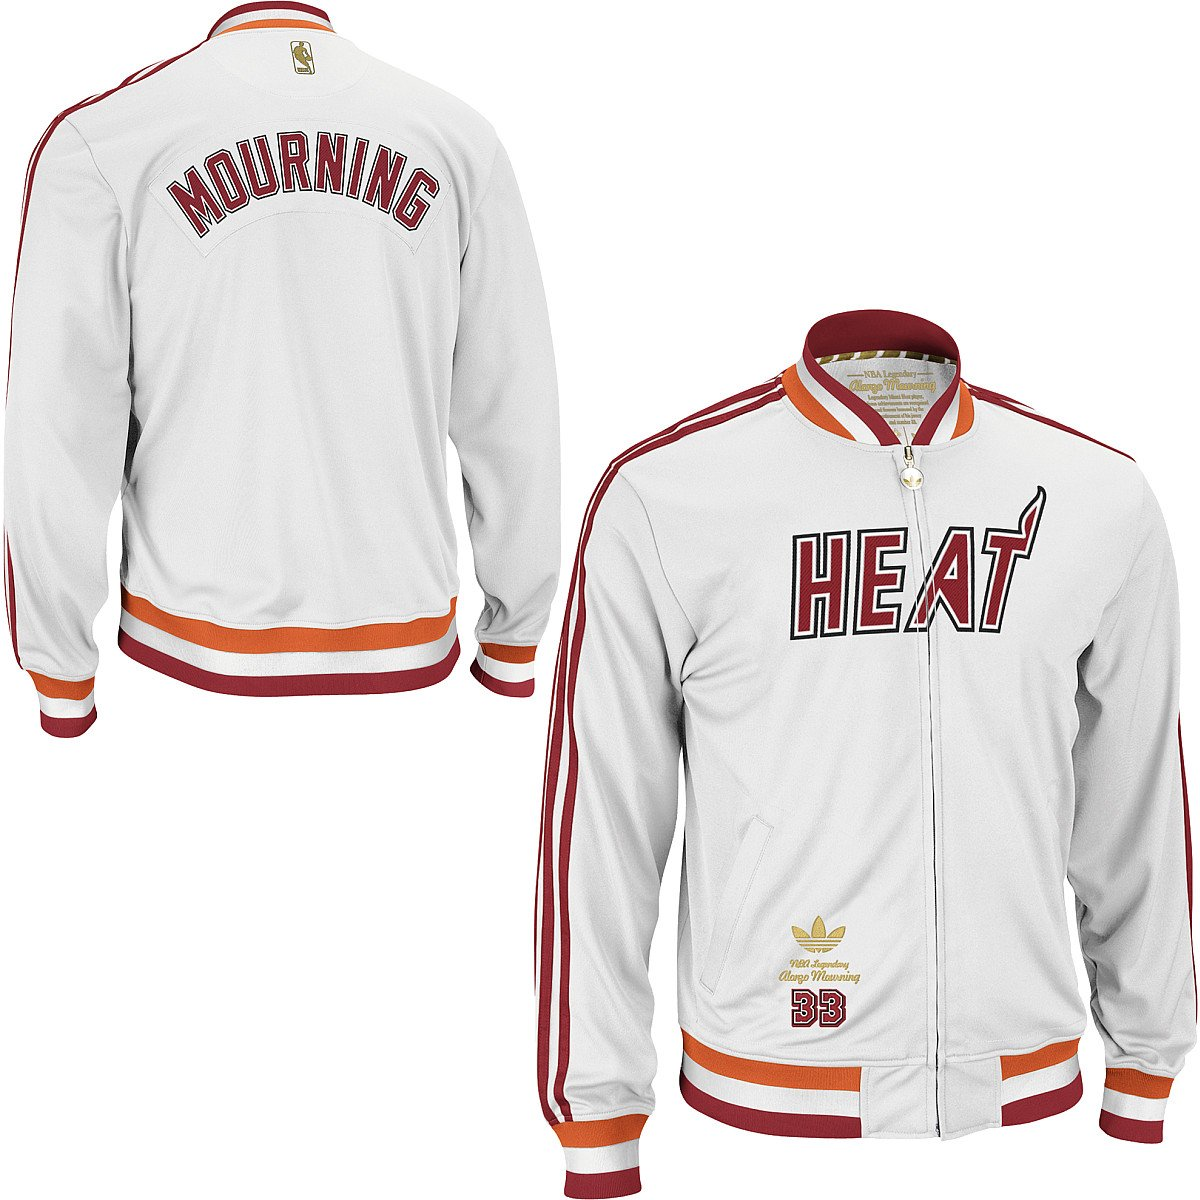 adidas Alonzo Mourning Miami Heat Originals Retro Legendary Player ...